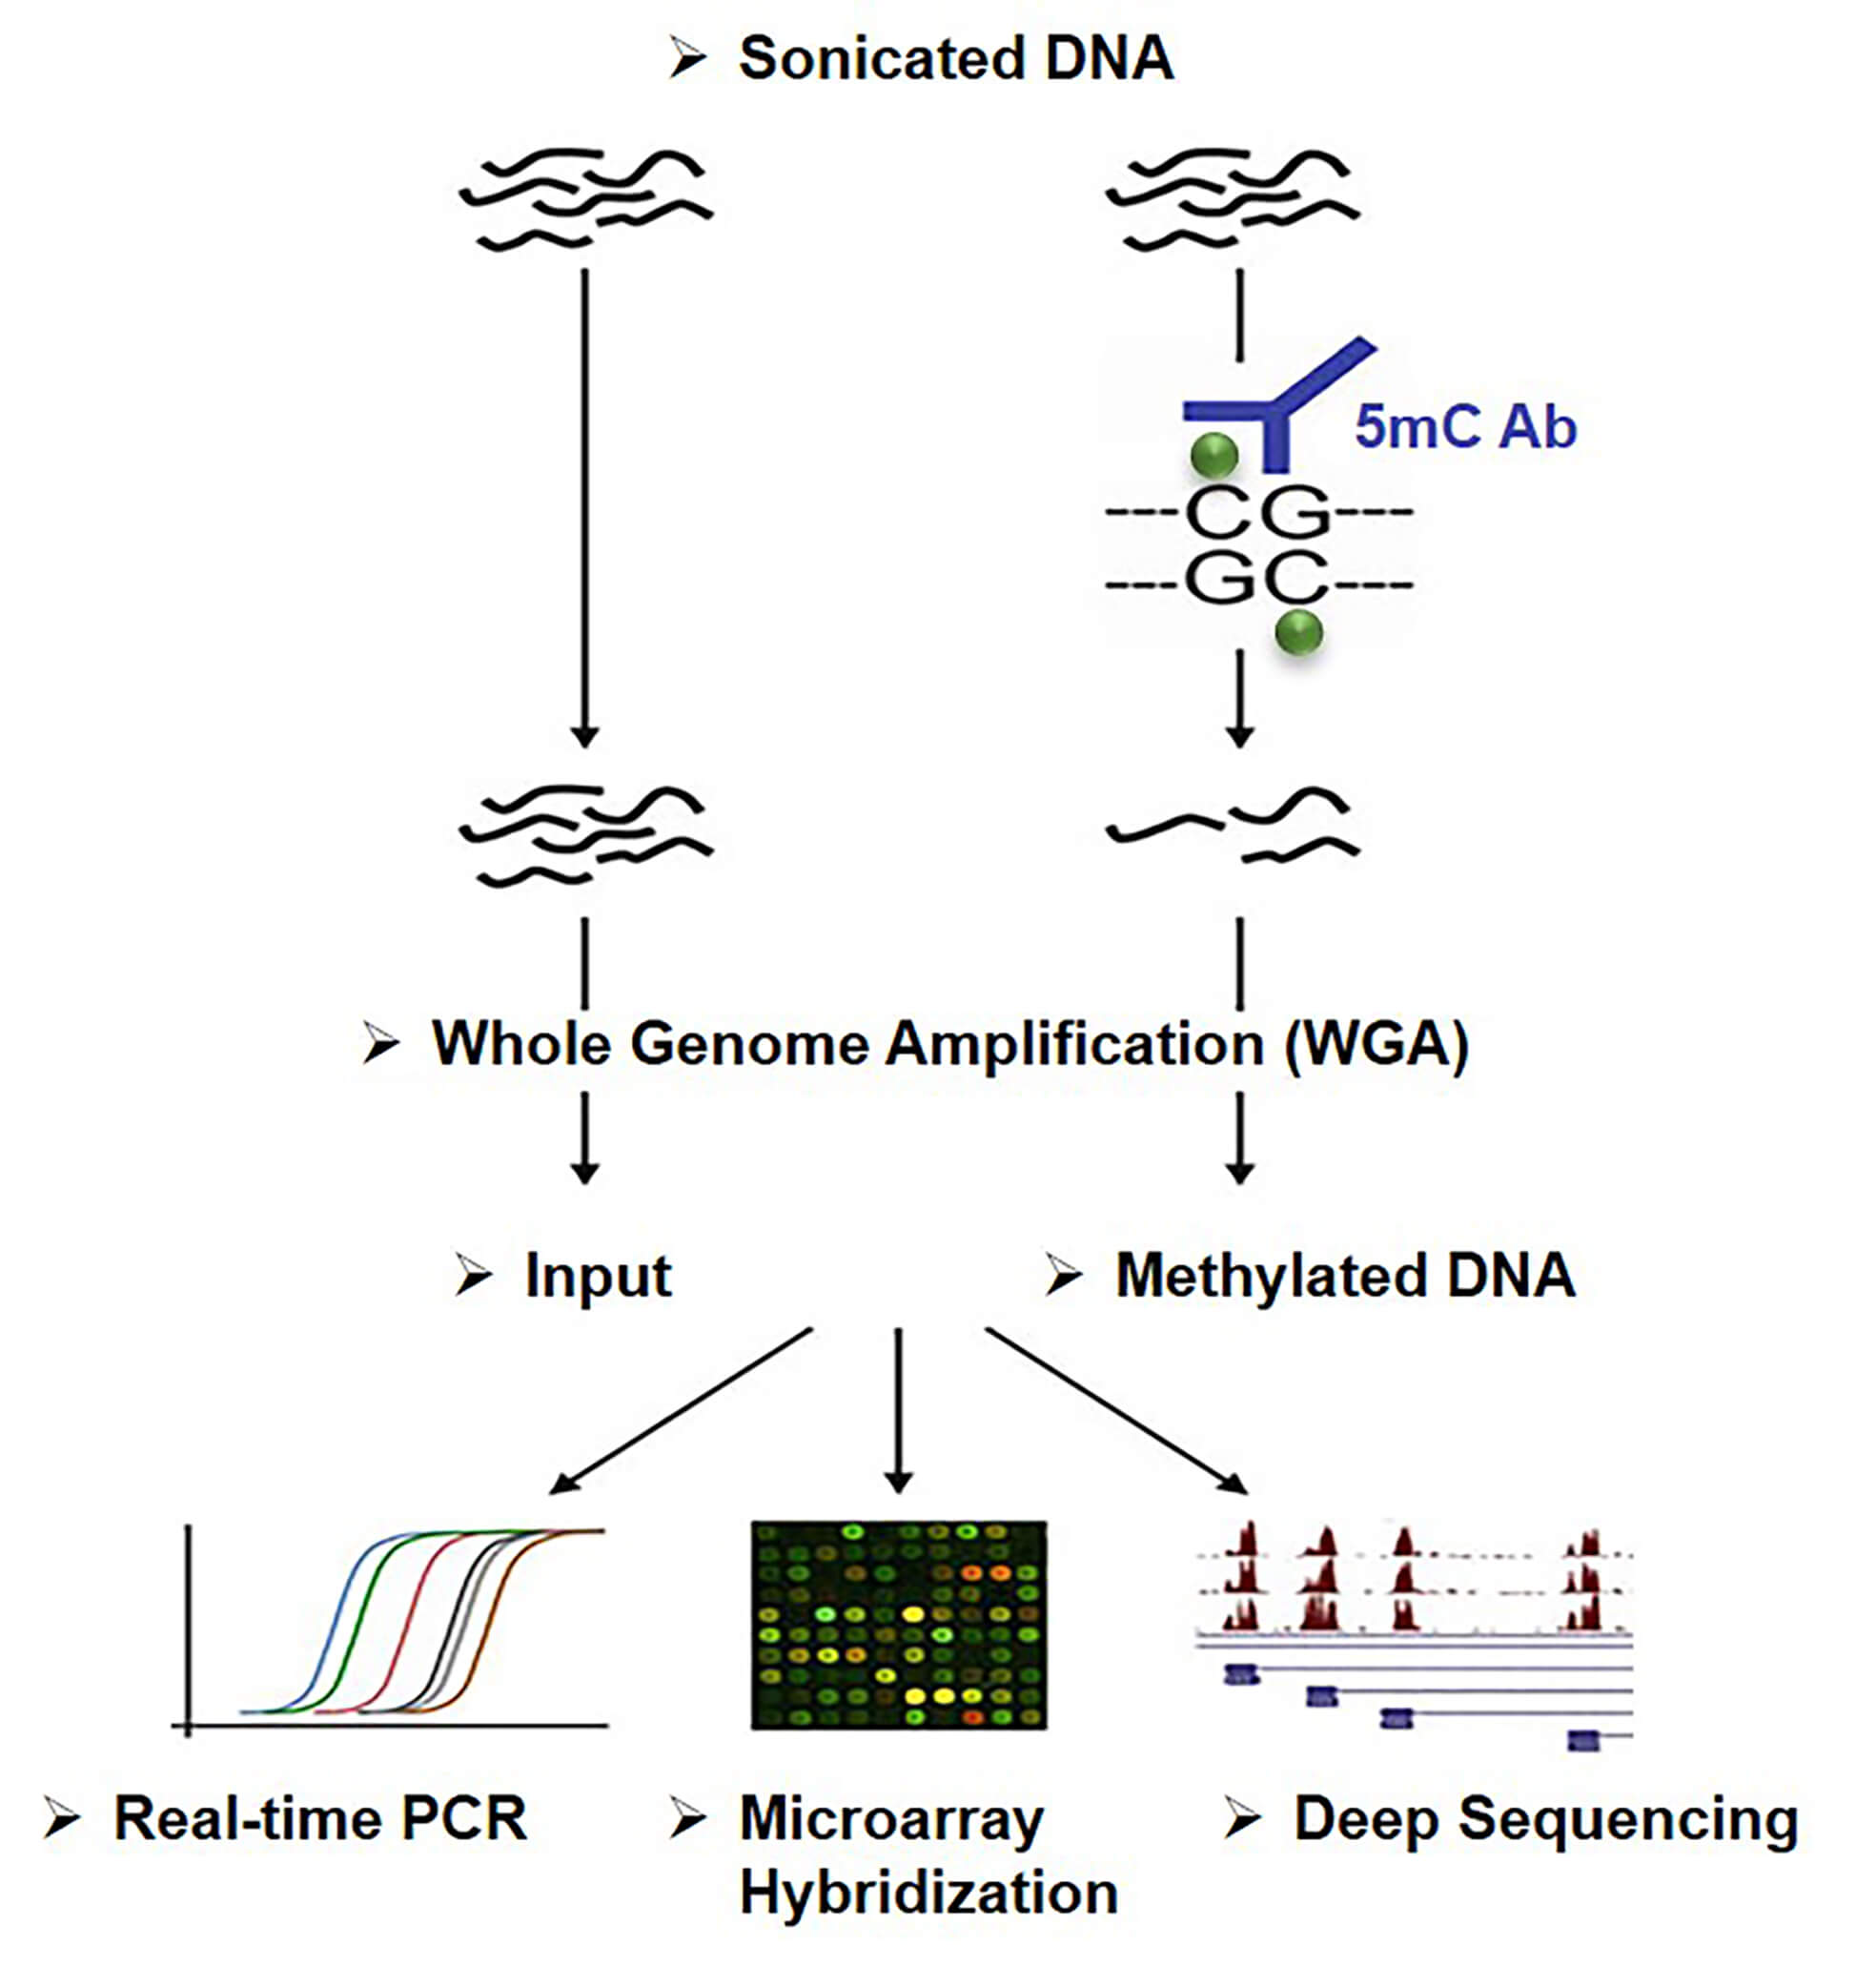 Principle of Methylated DNA immunoprecipitation (MeDIP)